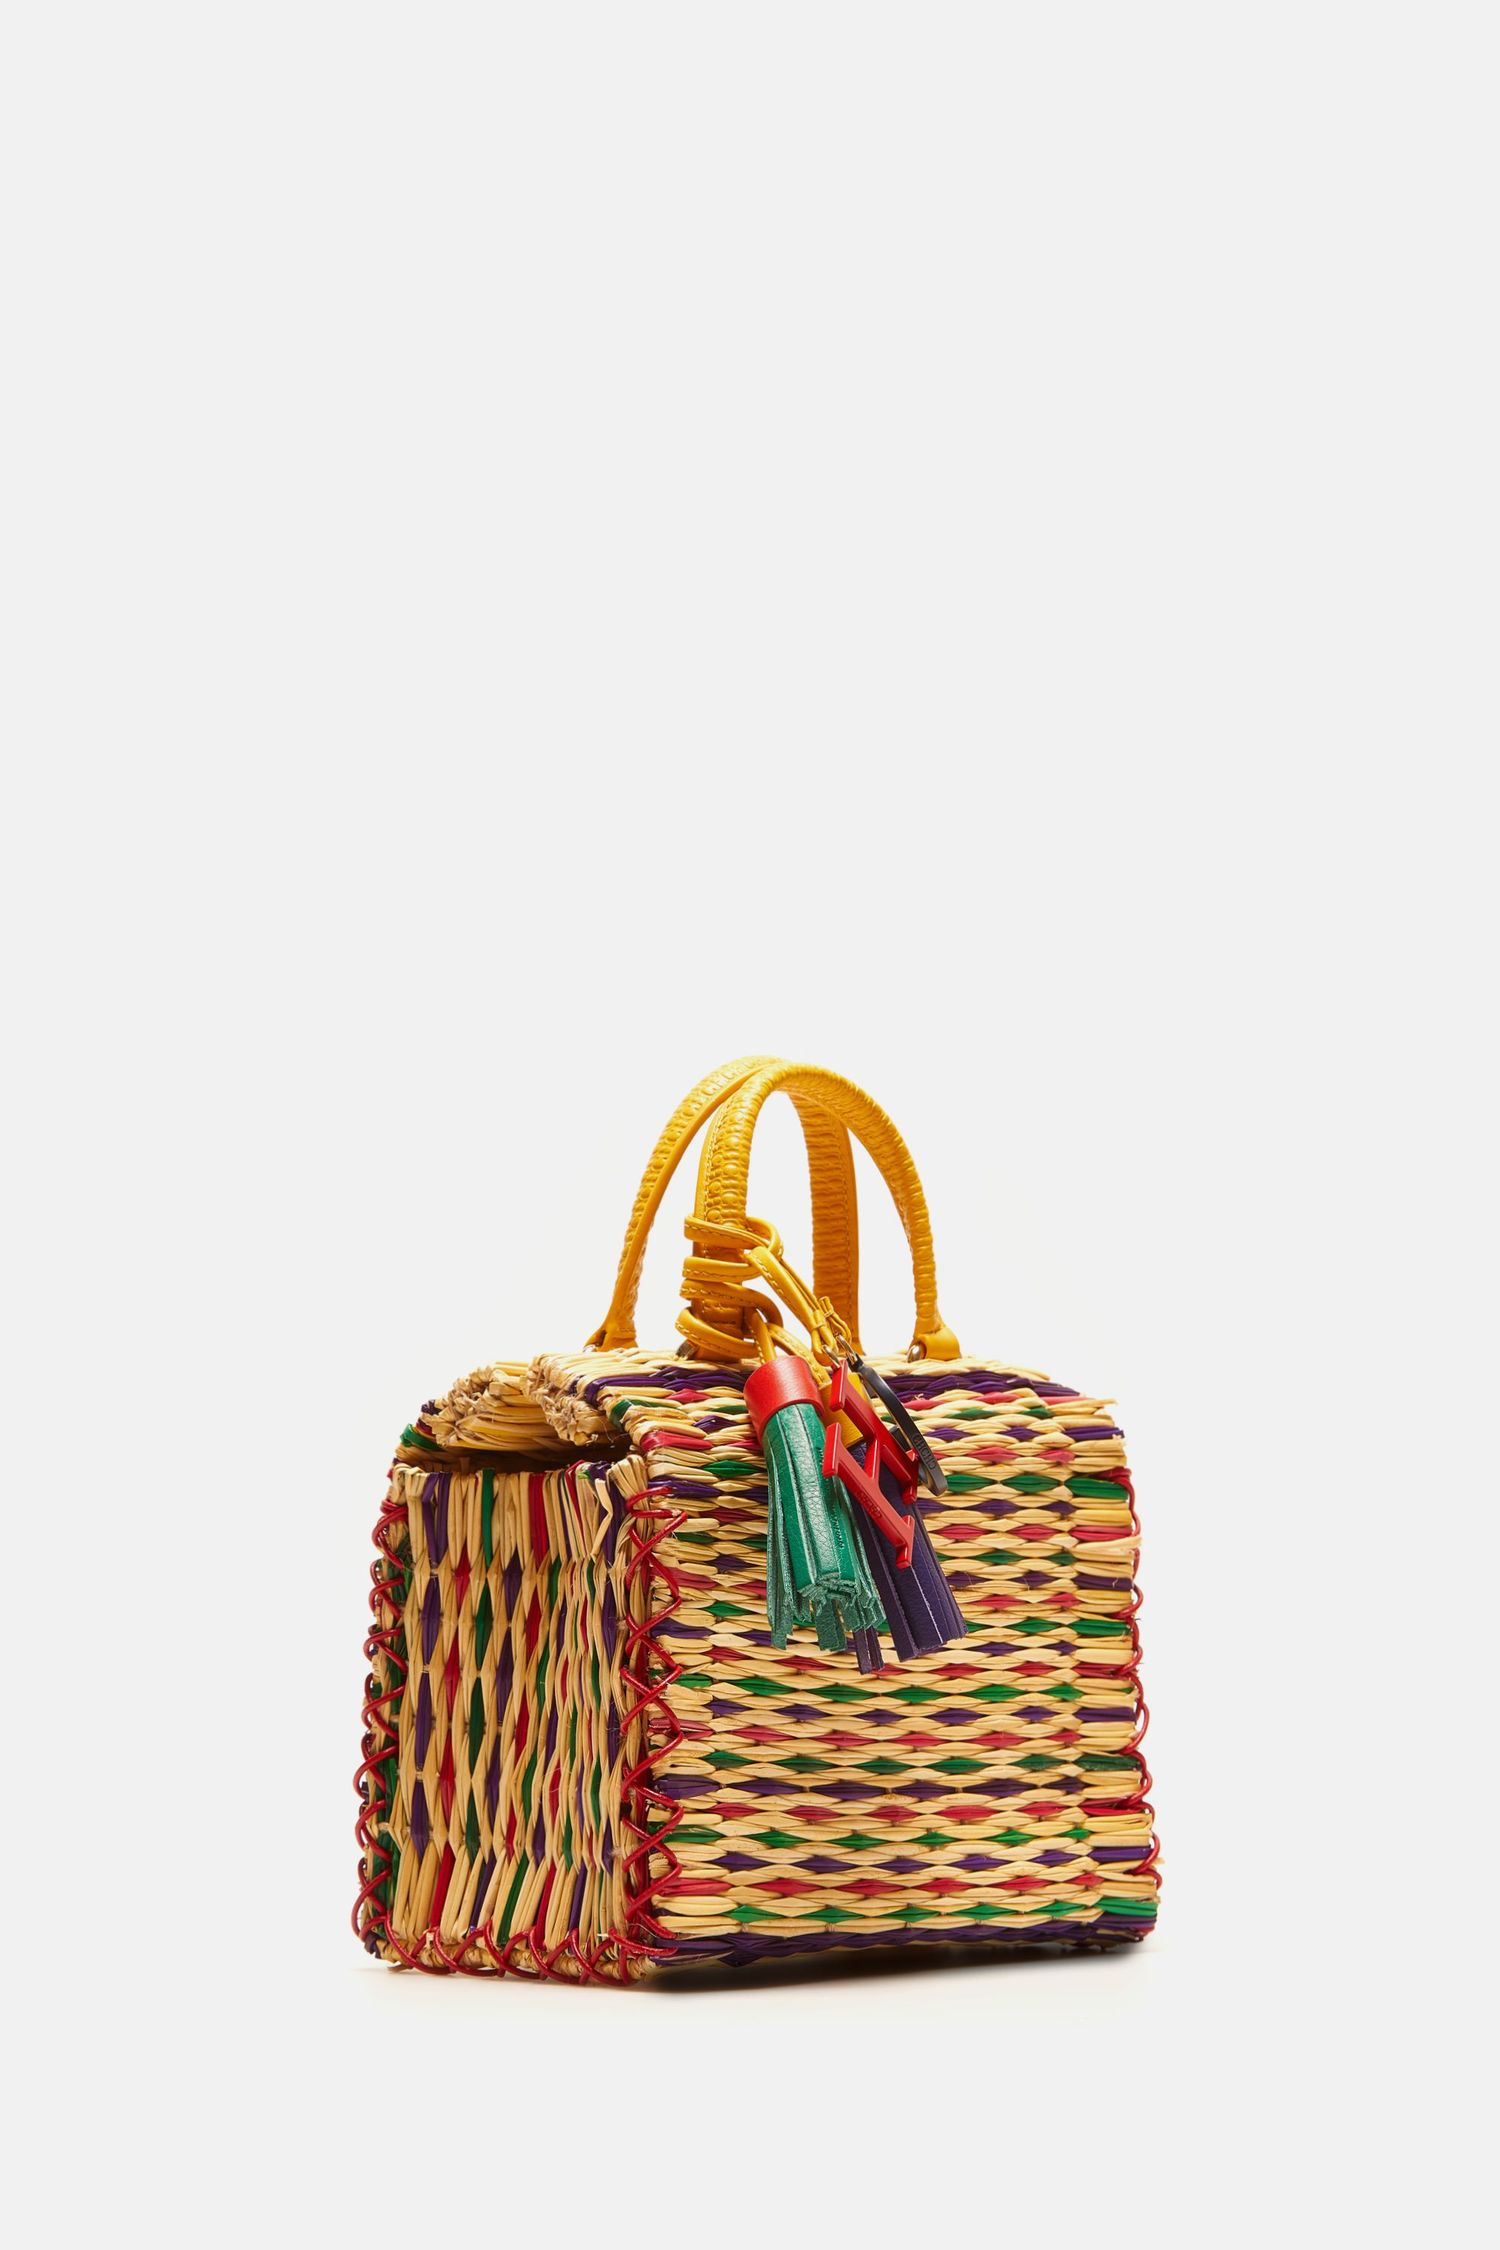 Aveiro | Small handbag